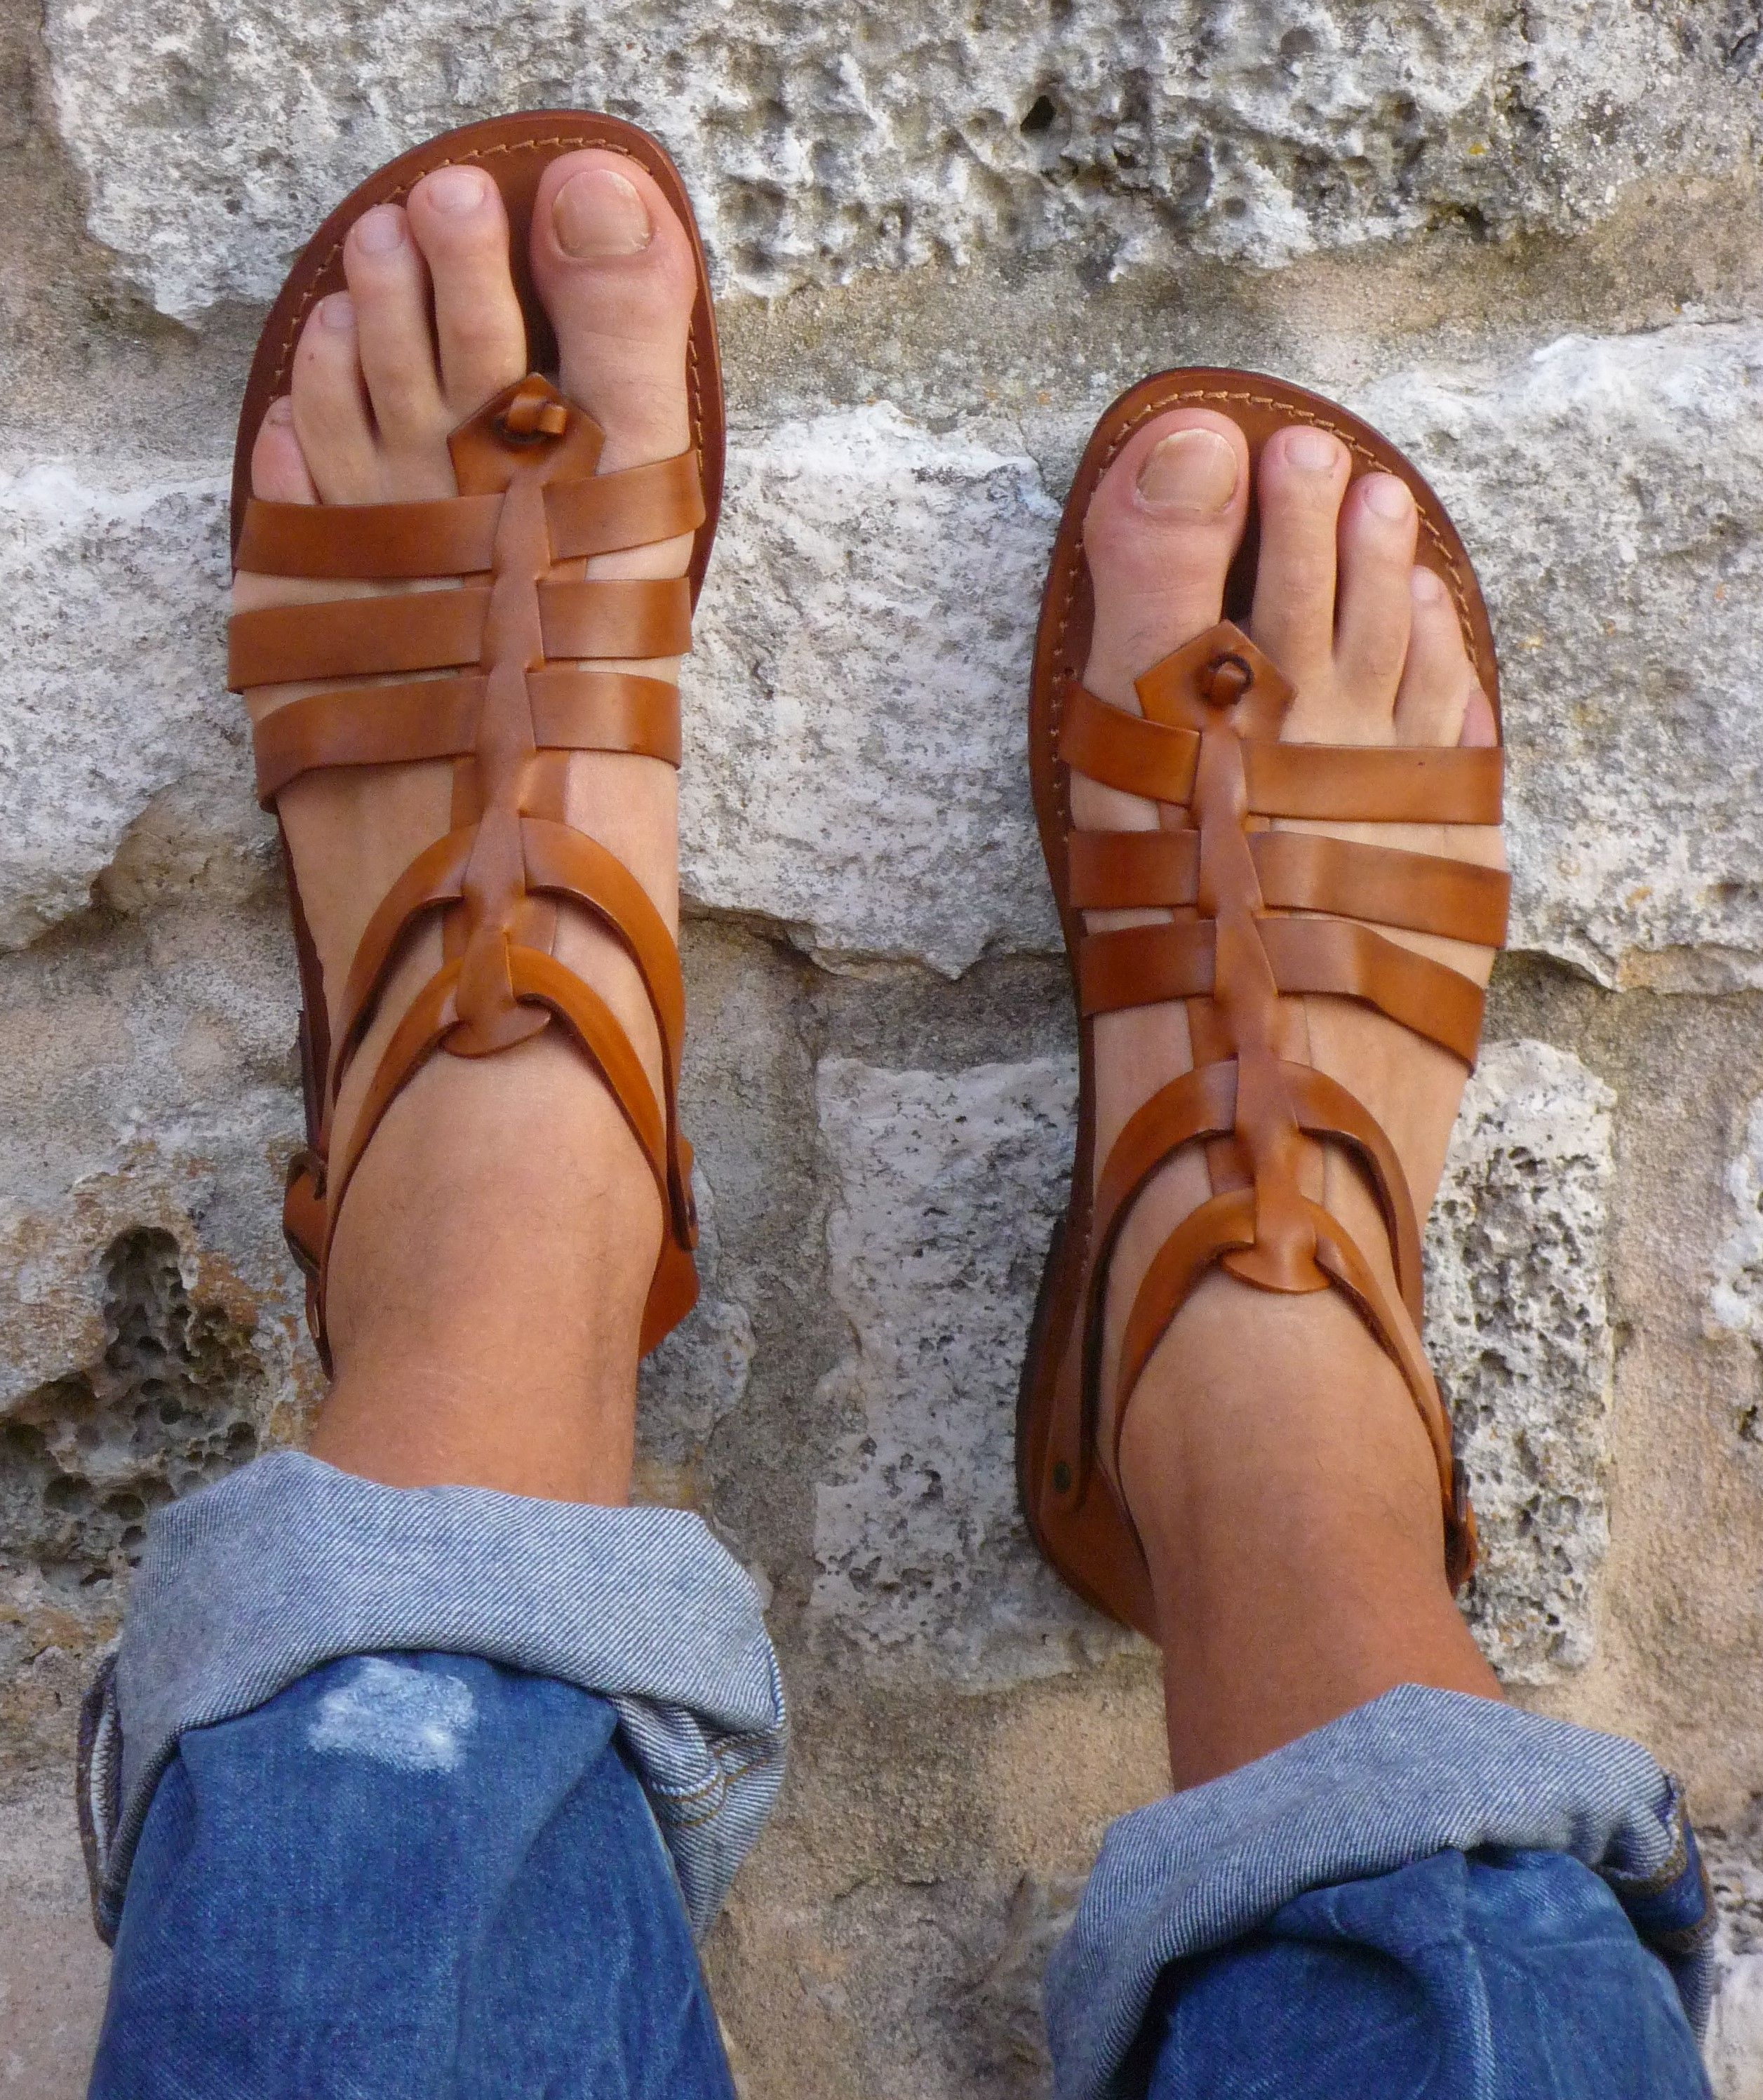 Women's sandals at kmart - Men S Sandals Kmart